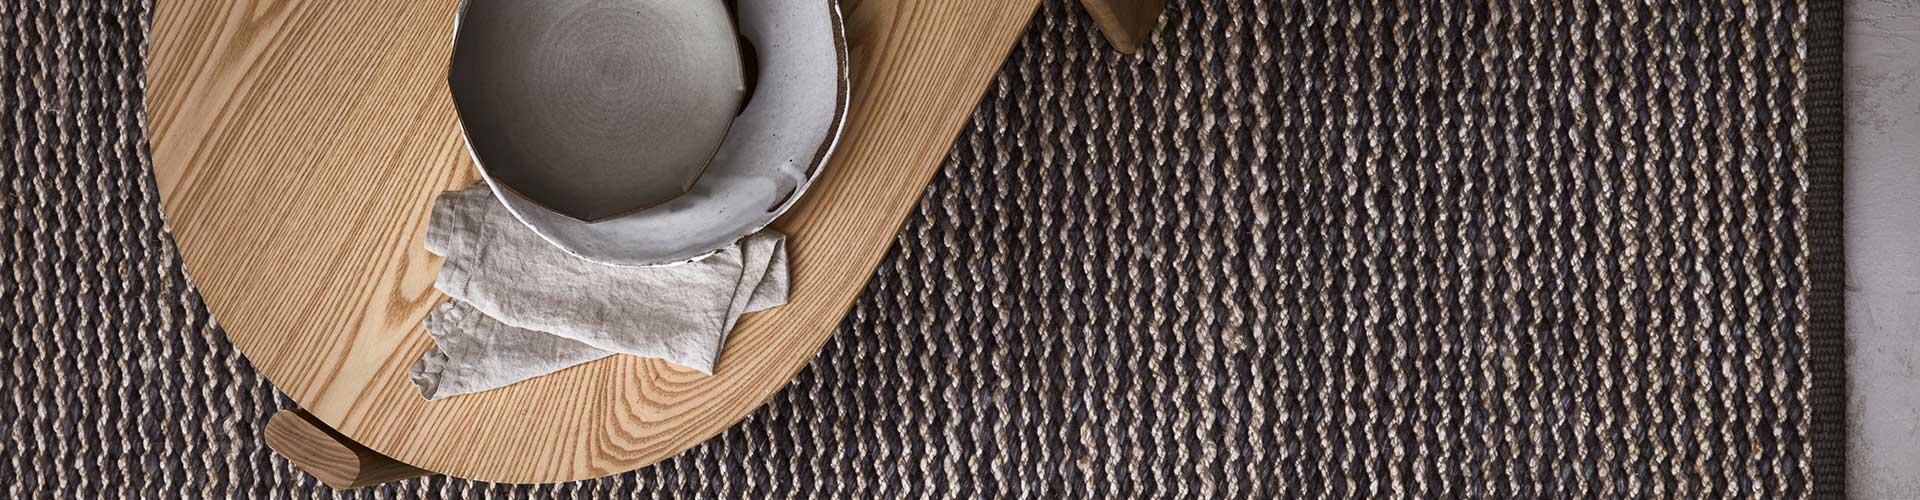 RM Living Cincinnati Contemporary Interior Design Rugs by Armadillo Armadillo2